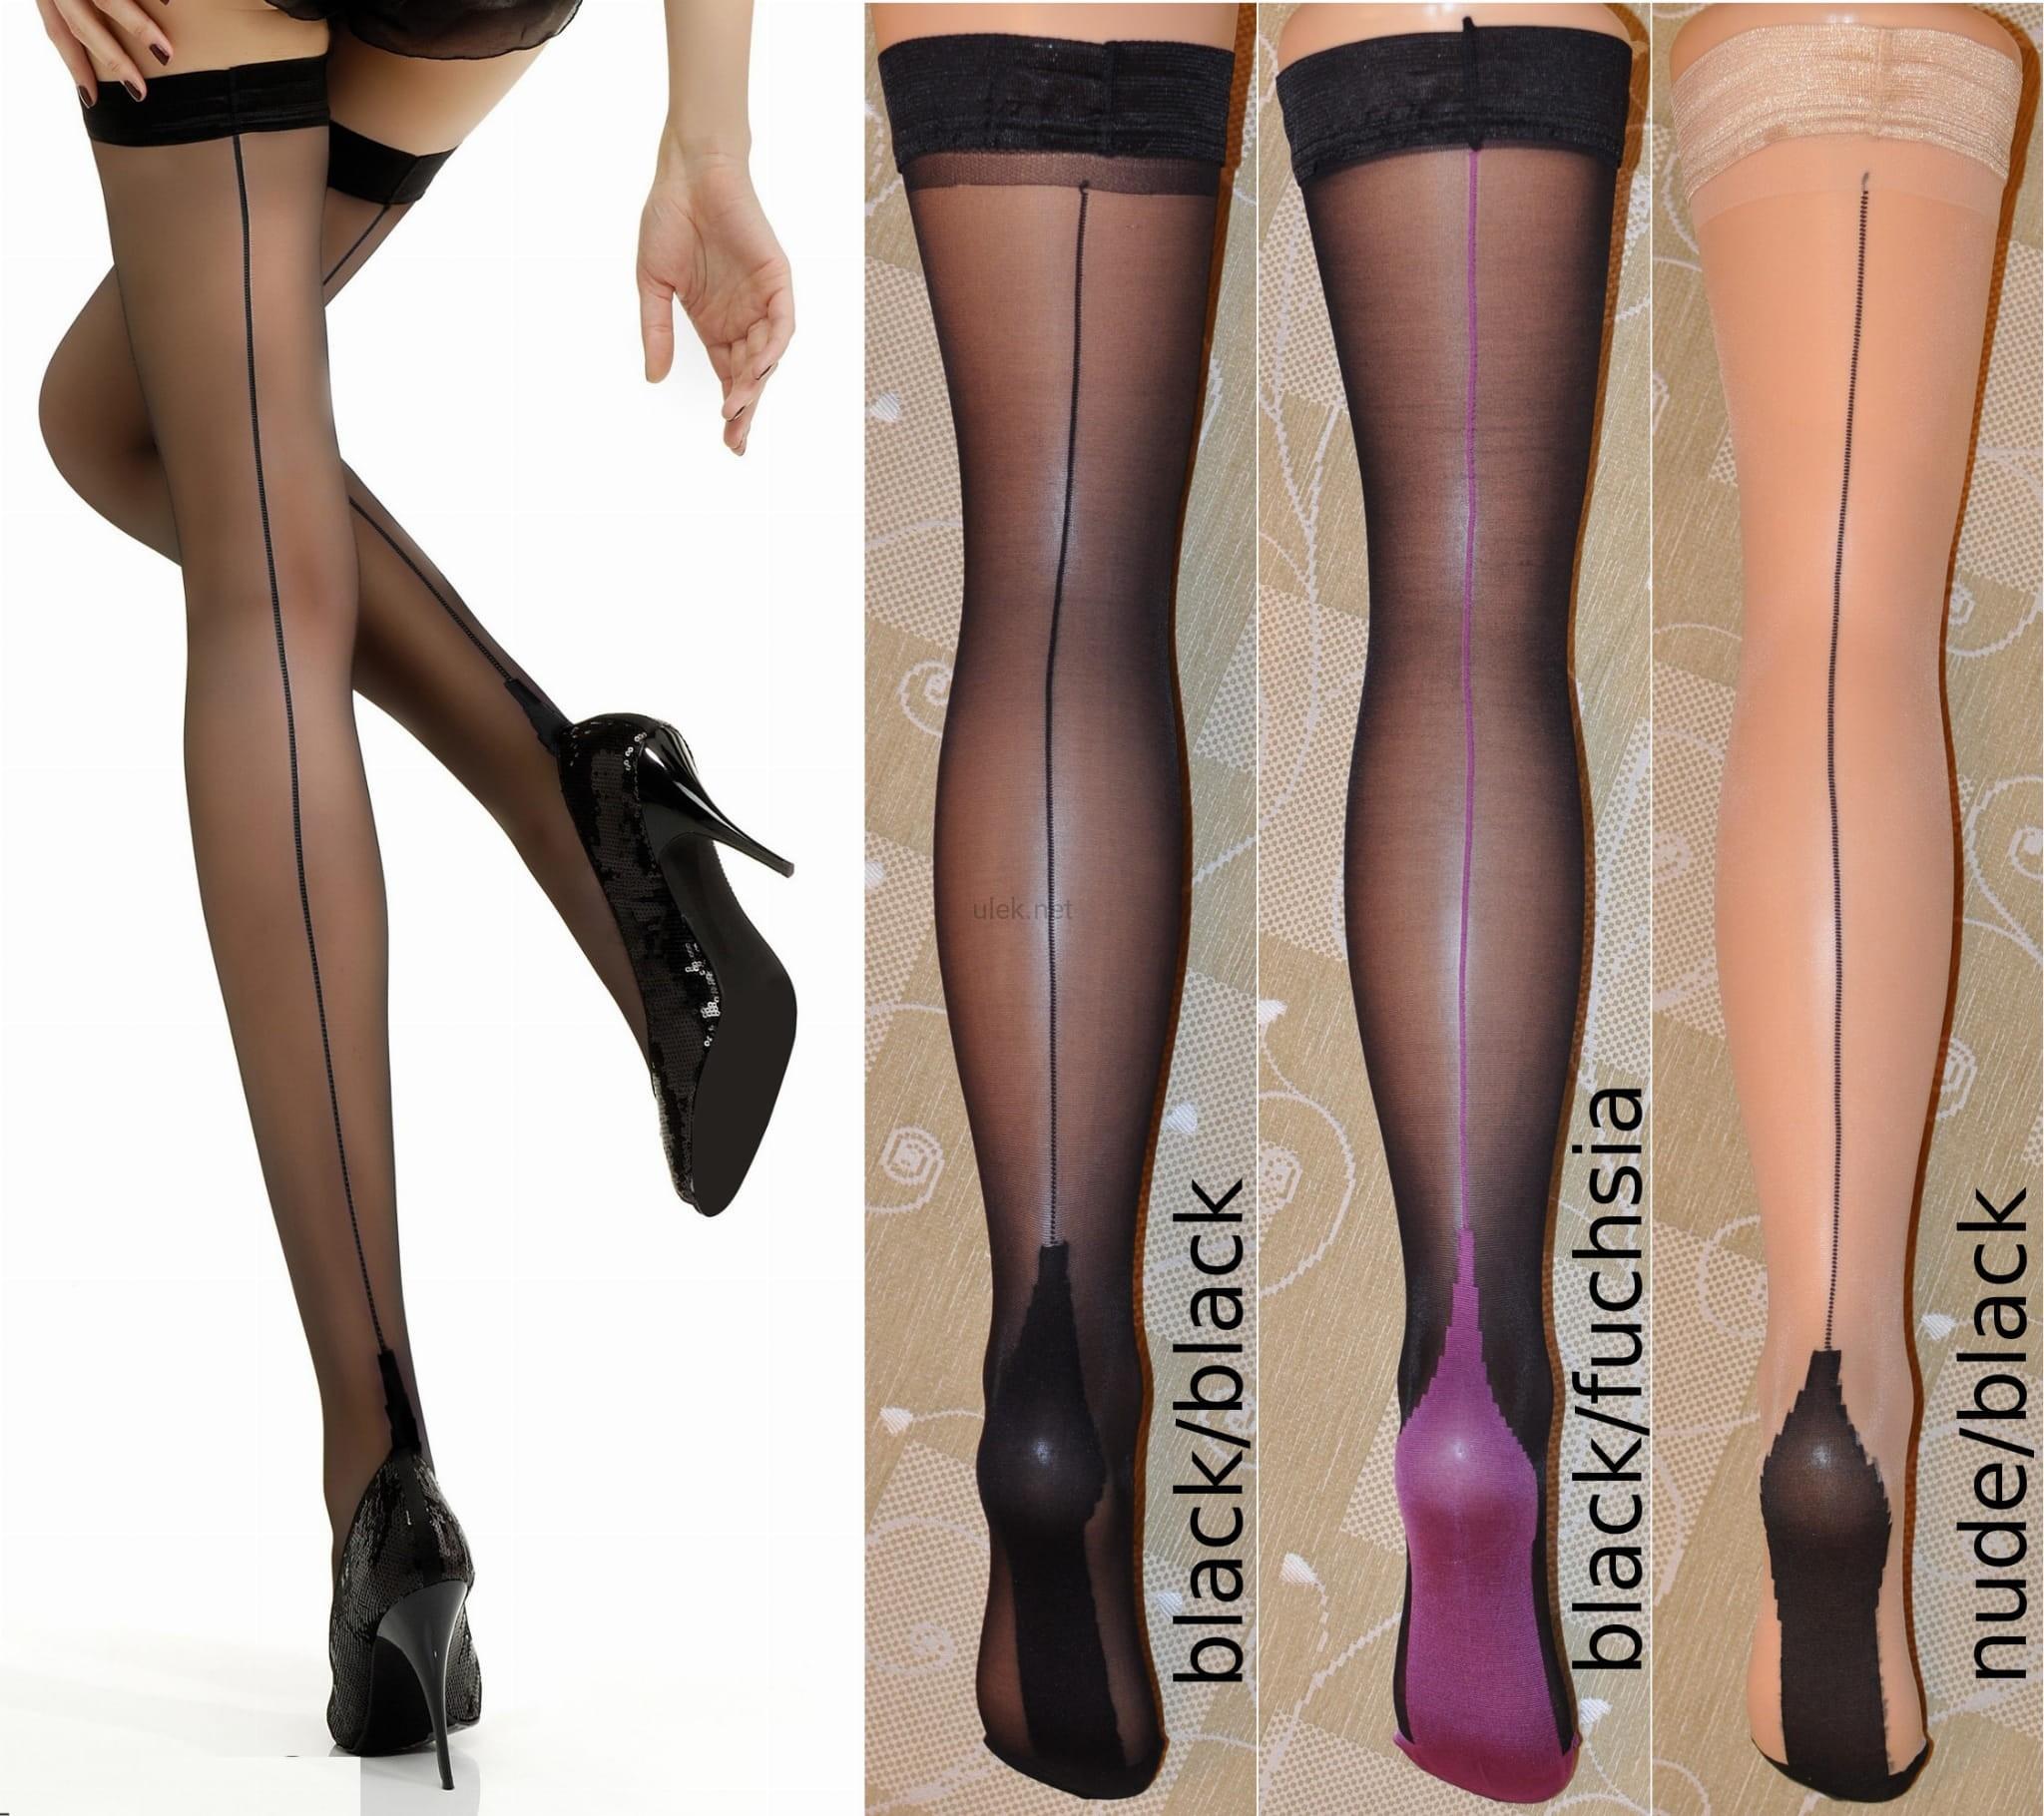 Jonathan Aston Vintage Legs Contrast Seam and Heel Stockings